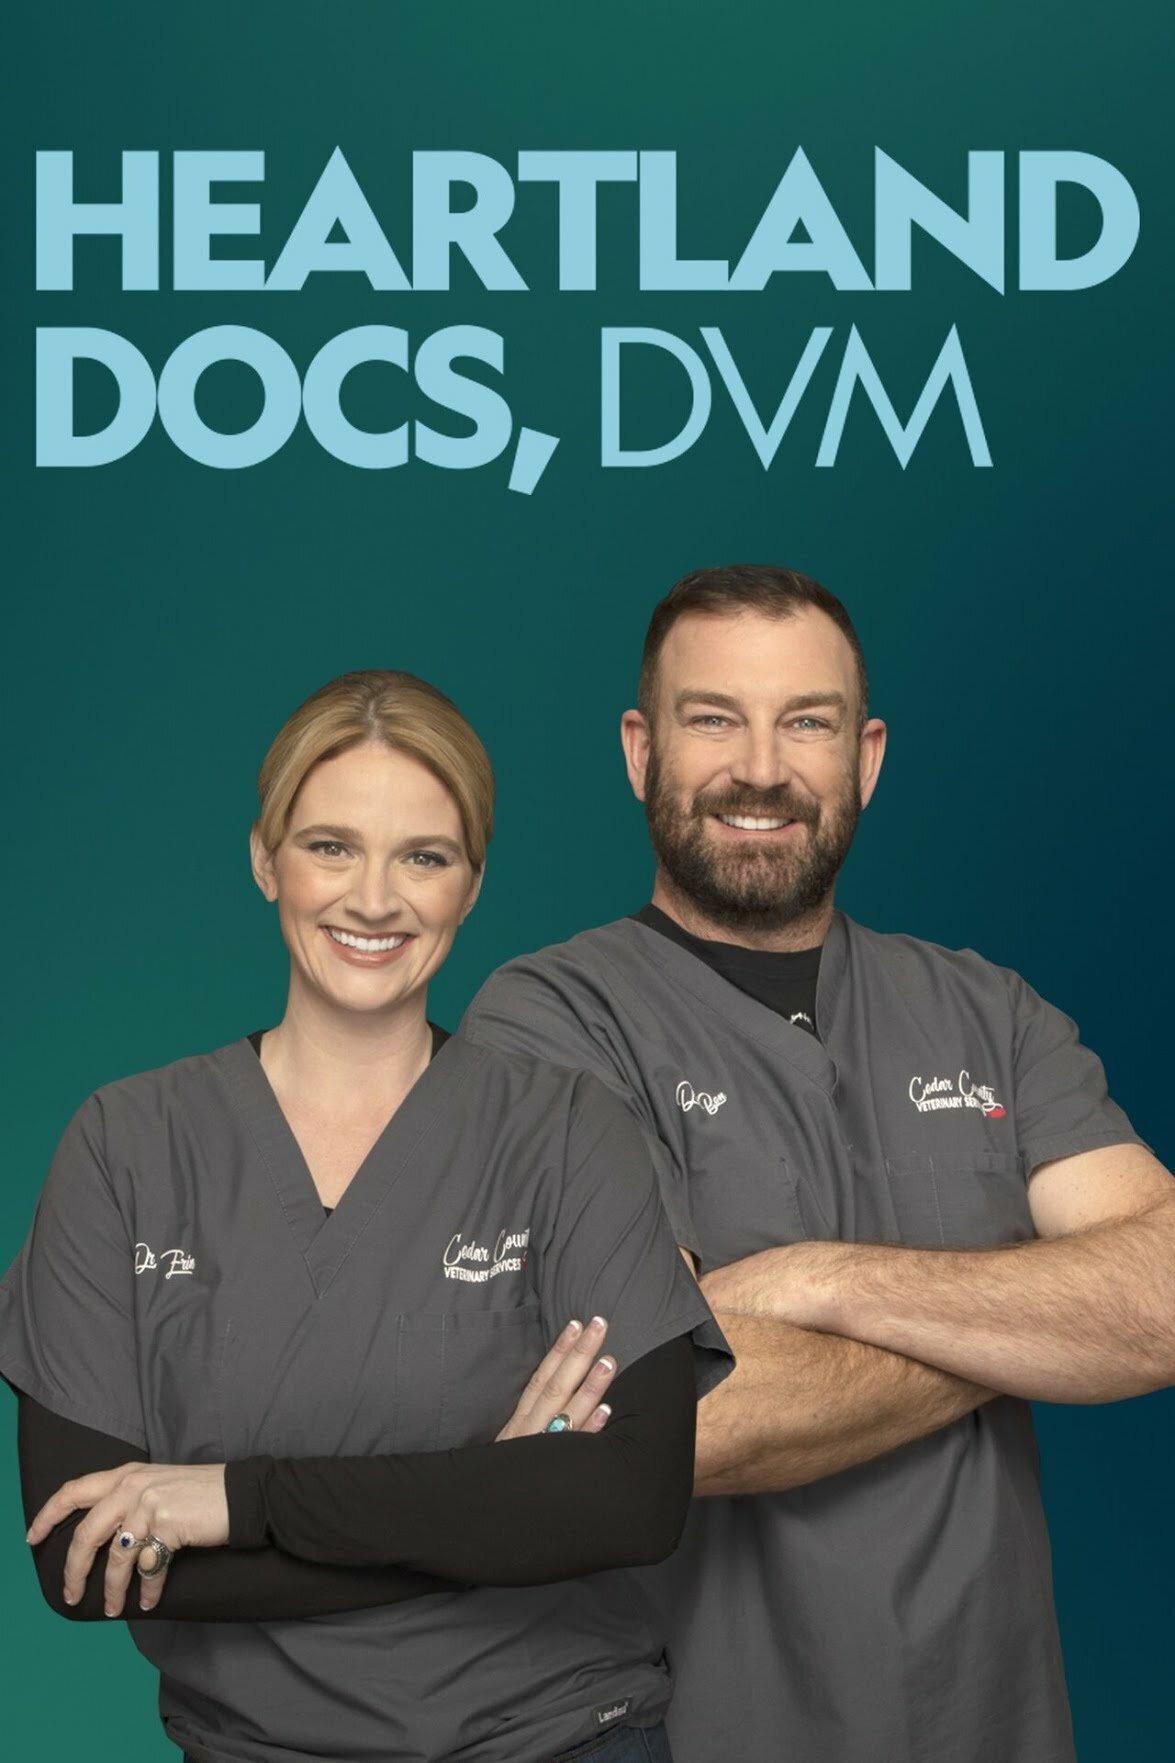 Heartland Docs, DVM ne zaman